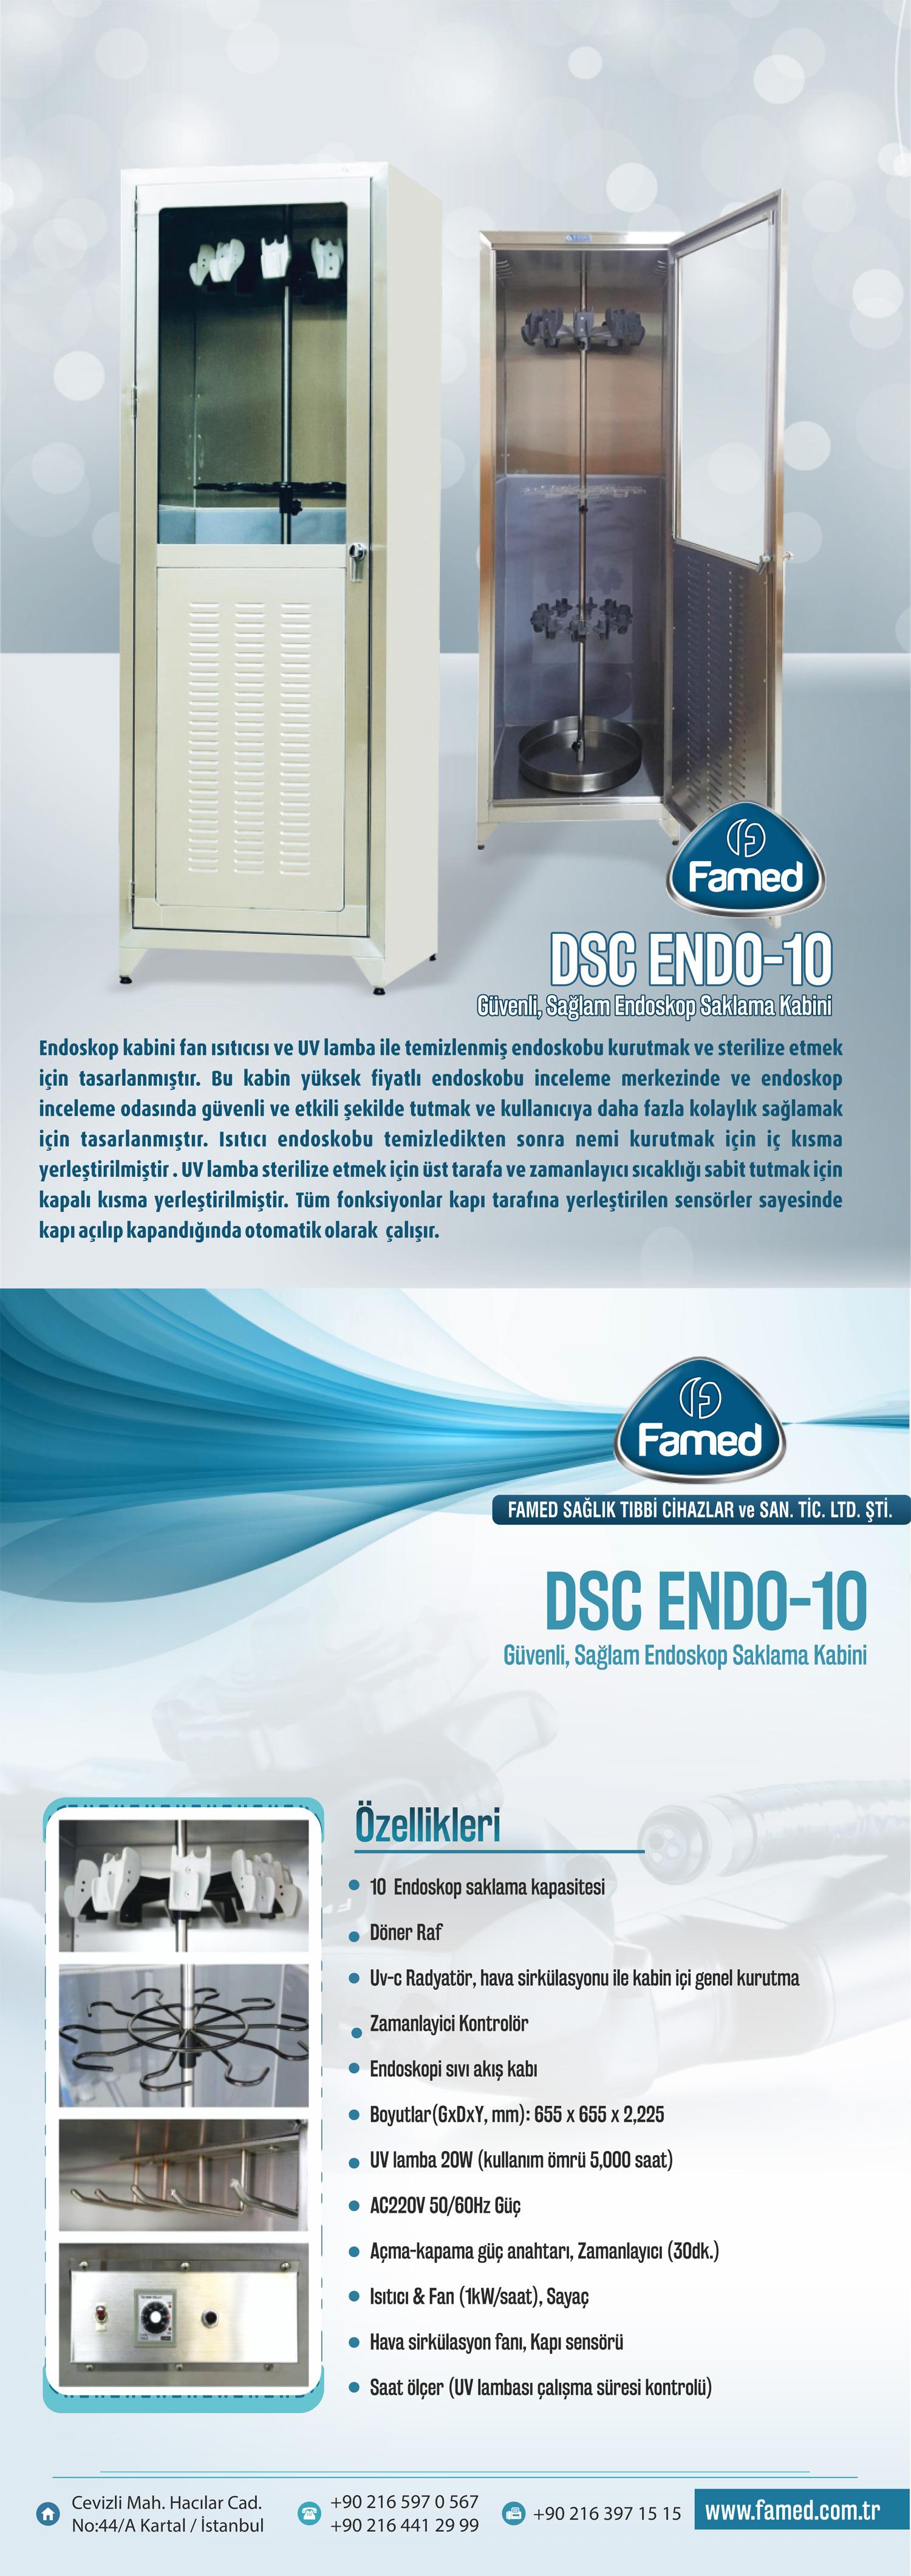 Dsc Endo-10